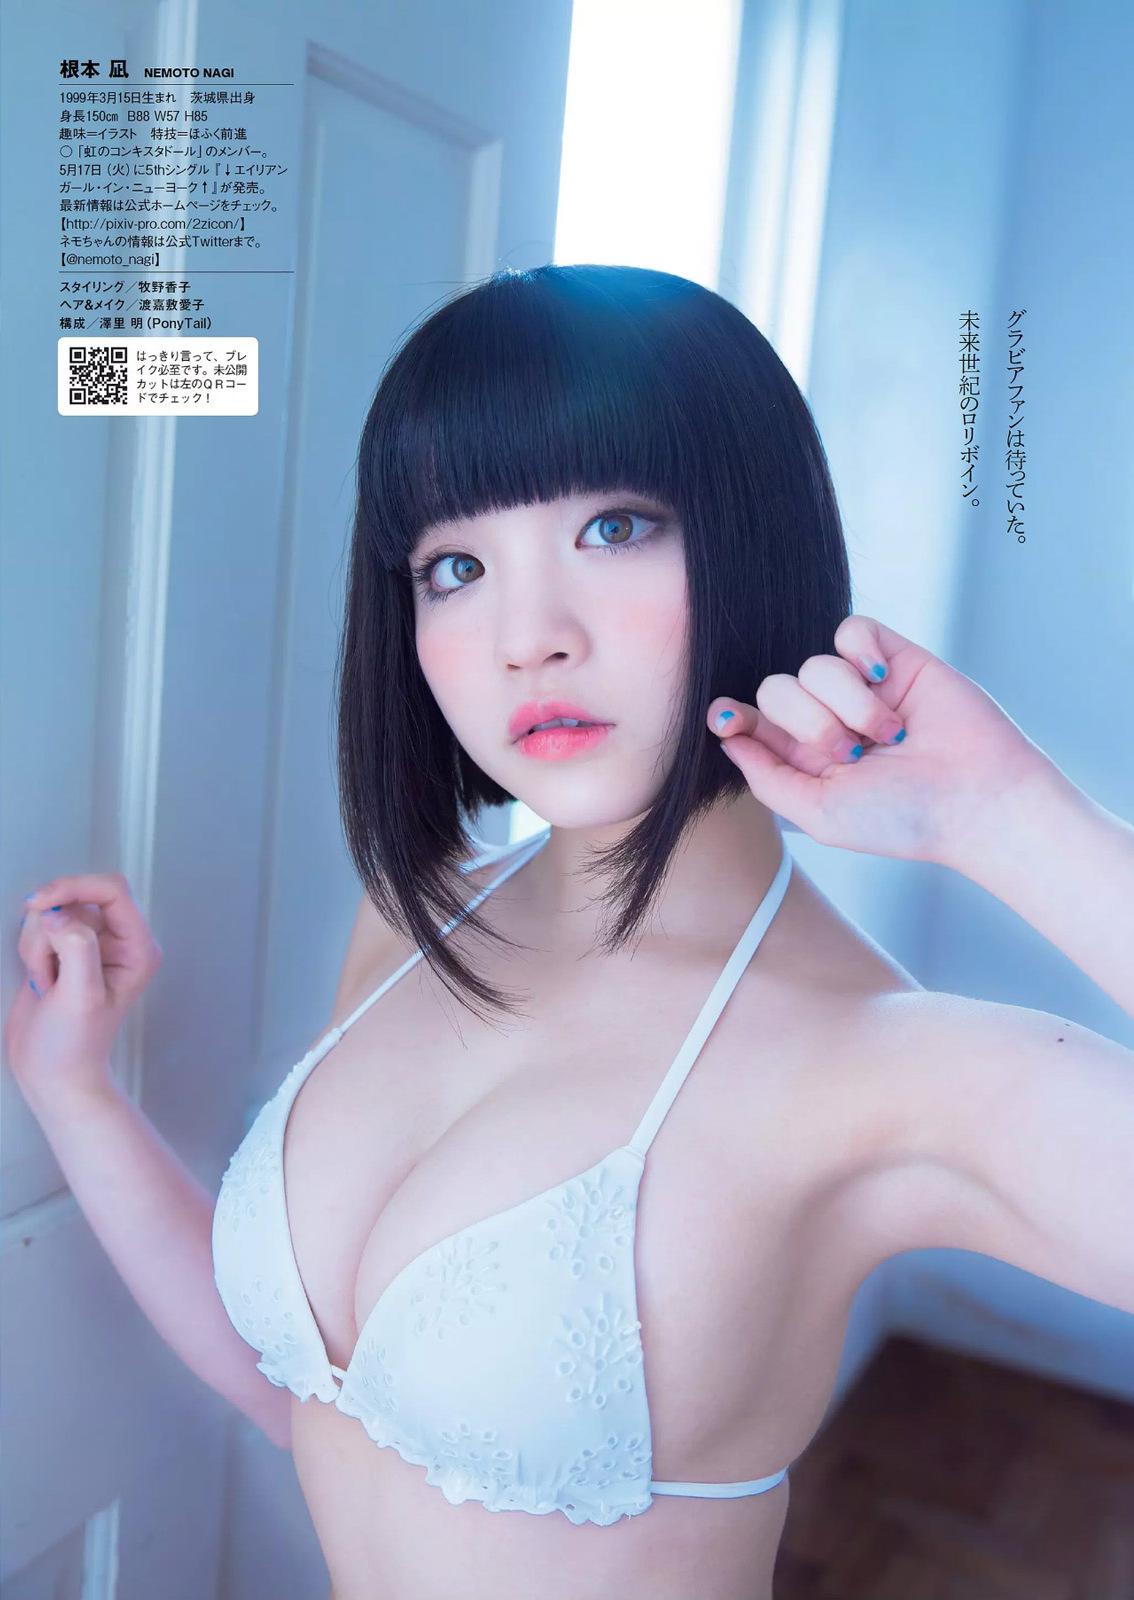 Nemoto Nagi 根本凪 NijiCon-虹コン, Weekly Playboy Magazine 2016 No.22 Gravure